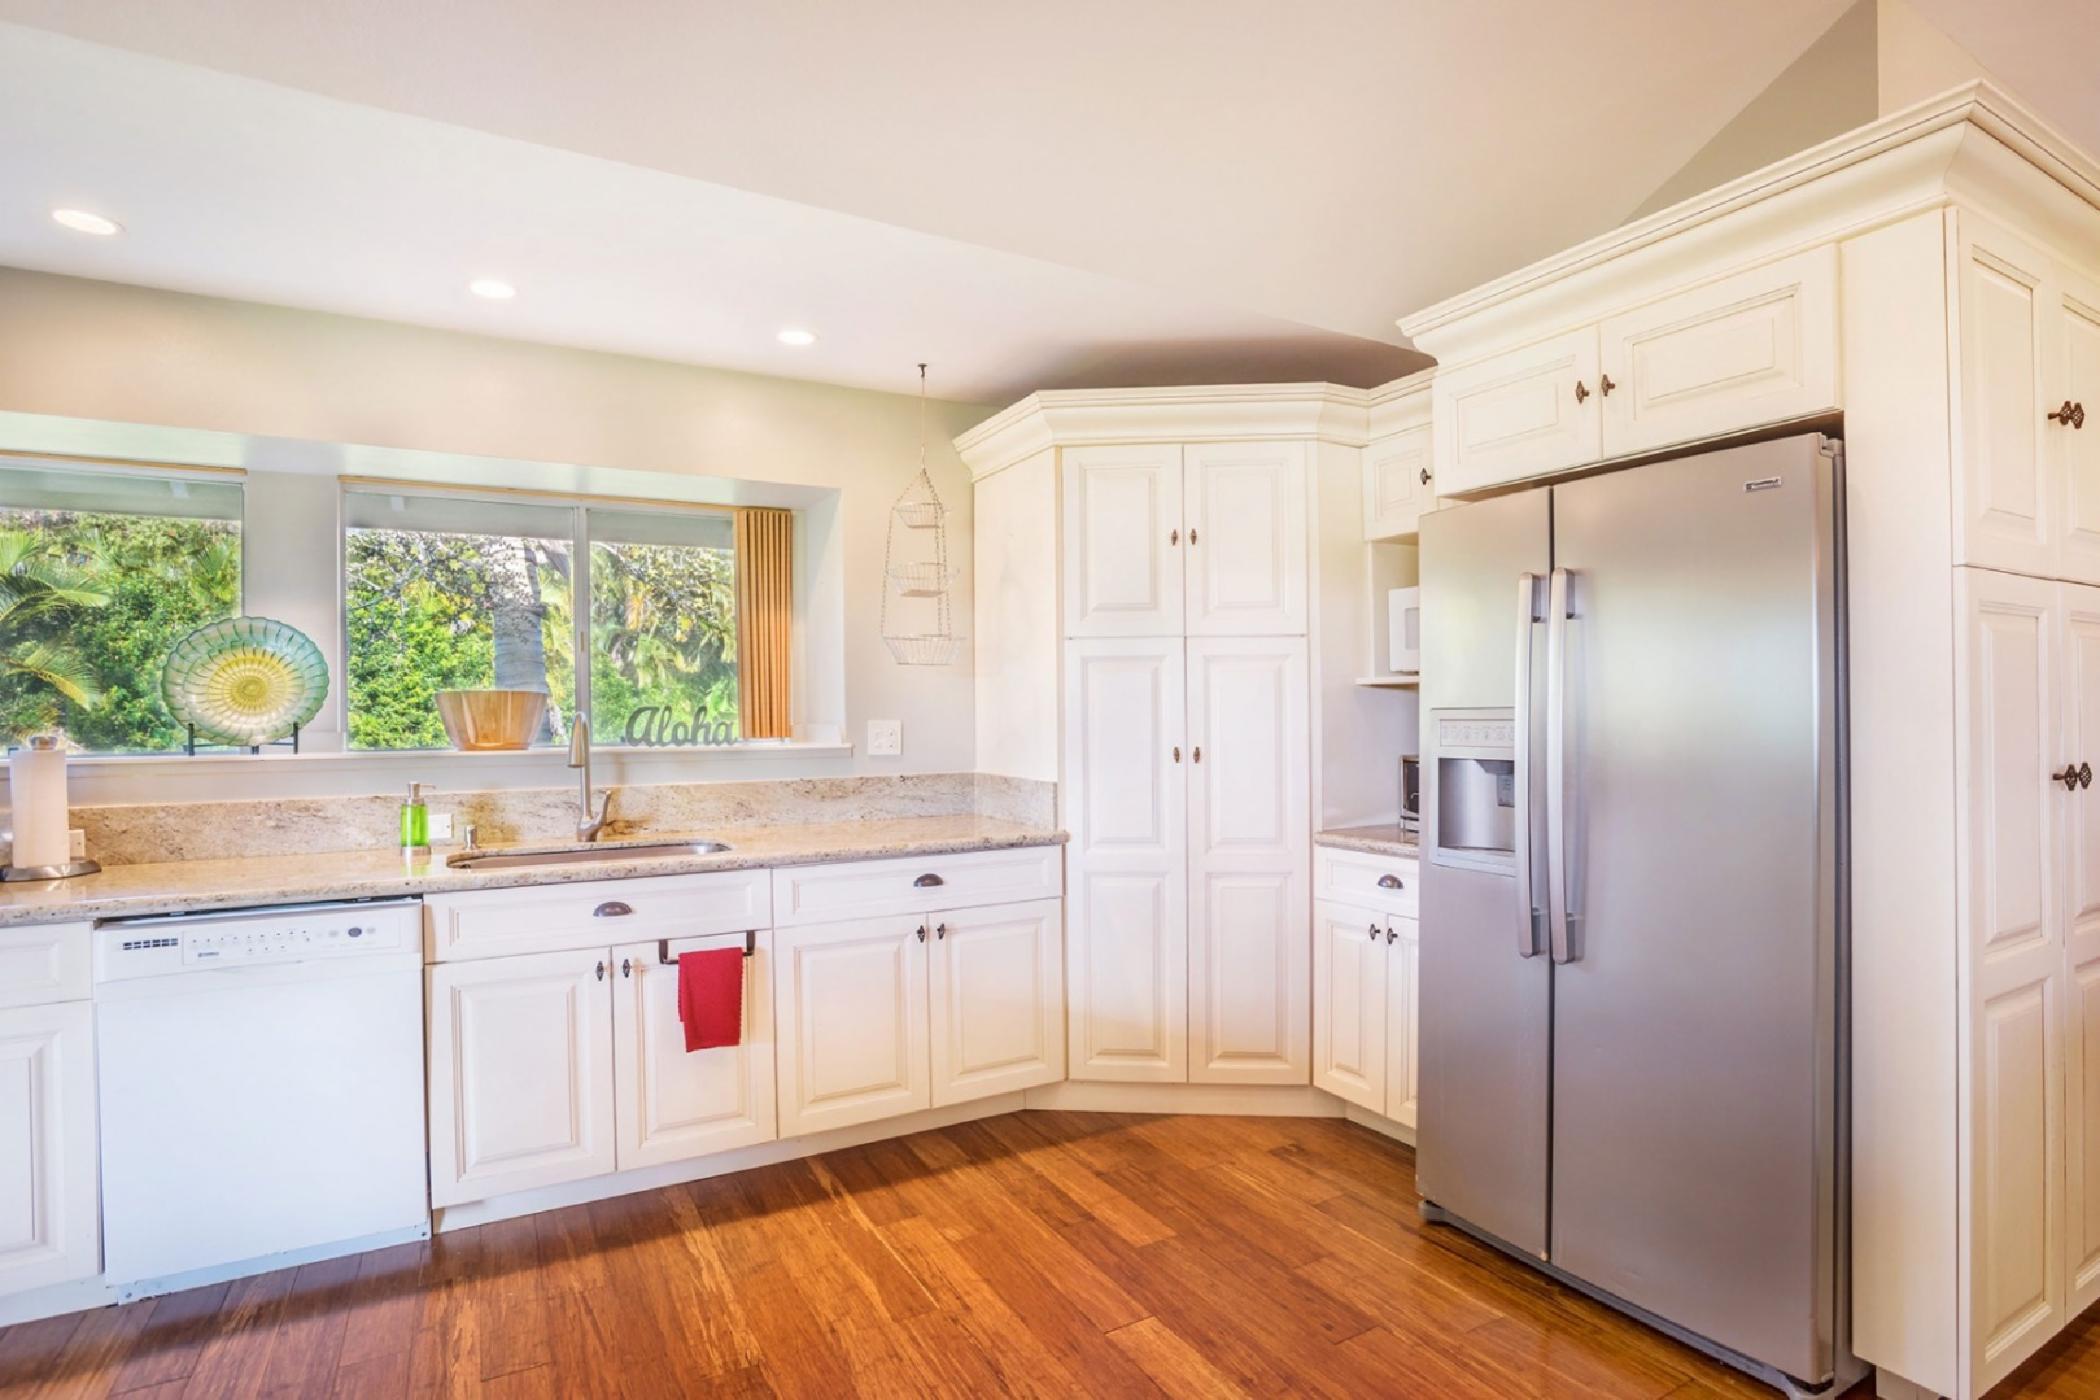 kitchen-fridge-and-sink.jpeg